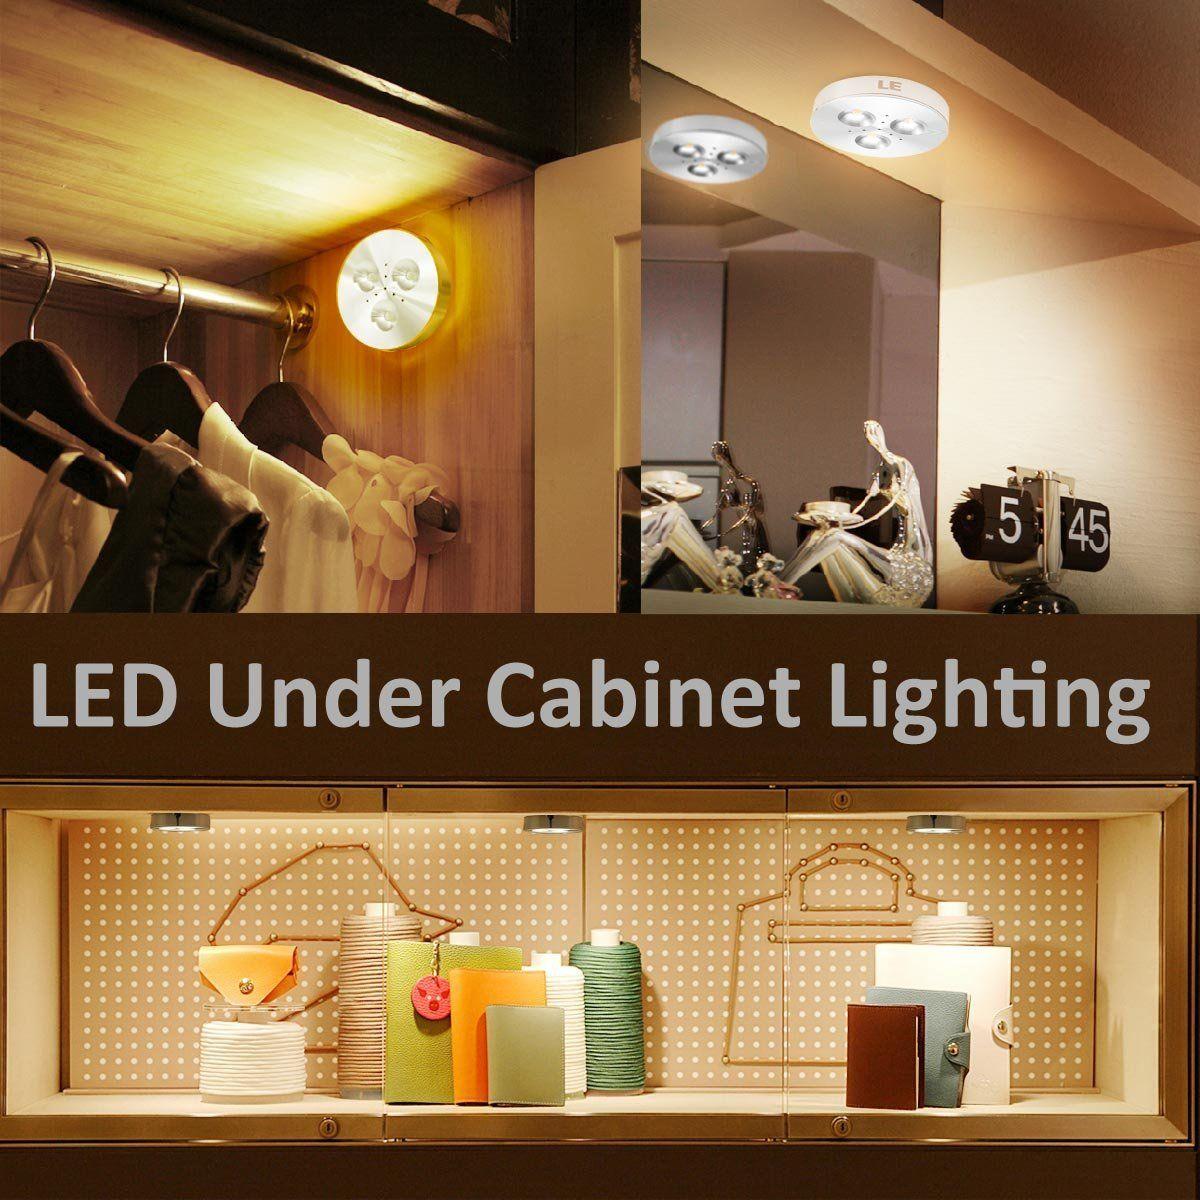 Bright Indoor Spotlight 3W LED Under Cabinet Lighting Puck Lights 12V DC Equal to 25W Halogen Bulb Jewelry LED Light Showcase Cabinet Light